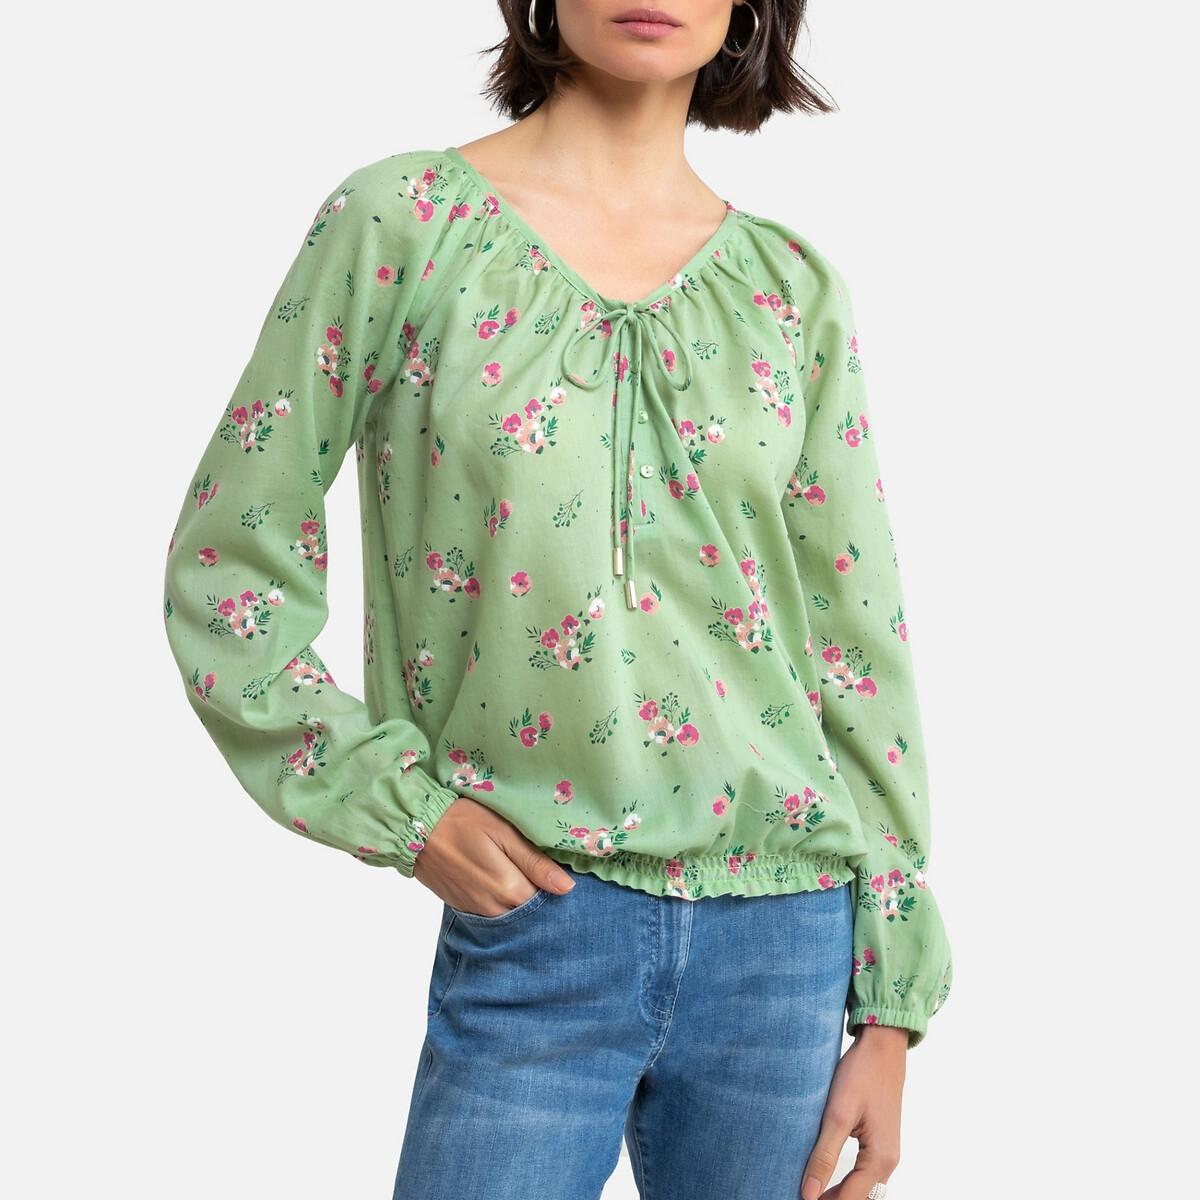 Blusa com estampado floral, mangas compridas